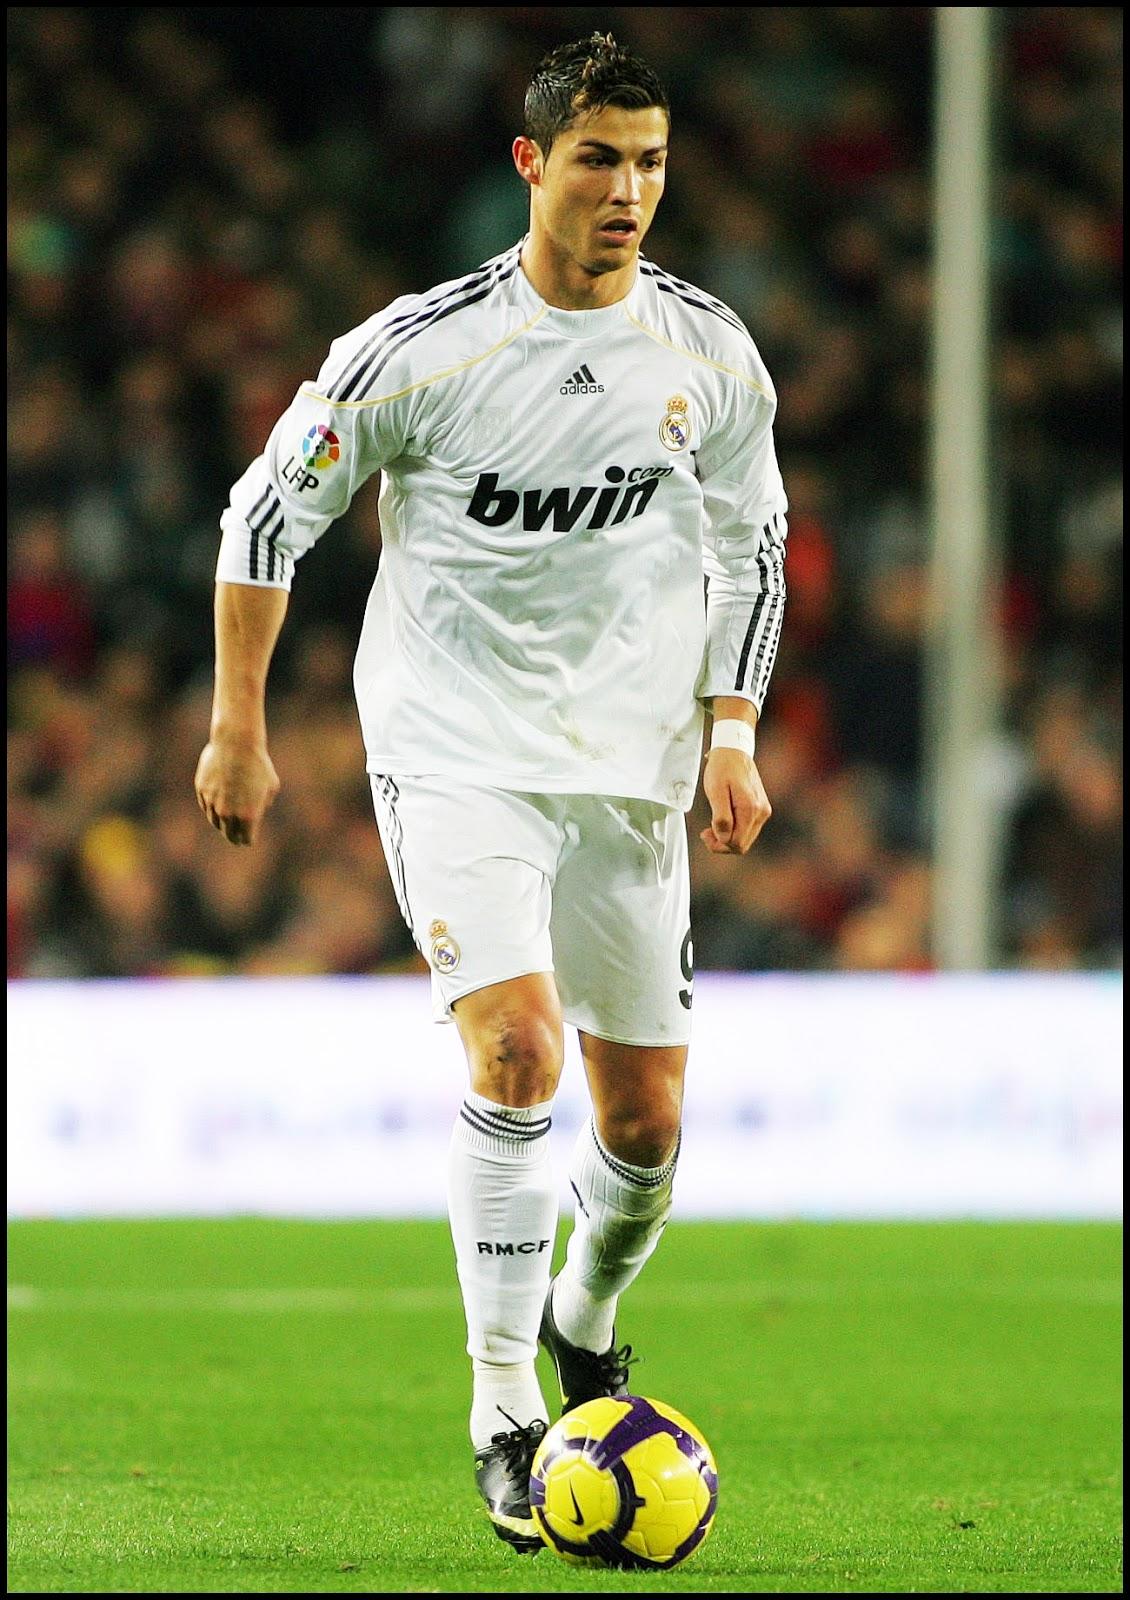 http://4.bp.blogspot.com/-WzVCZEXvCzE/Tv3nTMmUaZI/AAAAAAAAEAs/xRikmvtKHGg/s1600/Cristiano+Ronaldo+IV.jpg